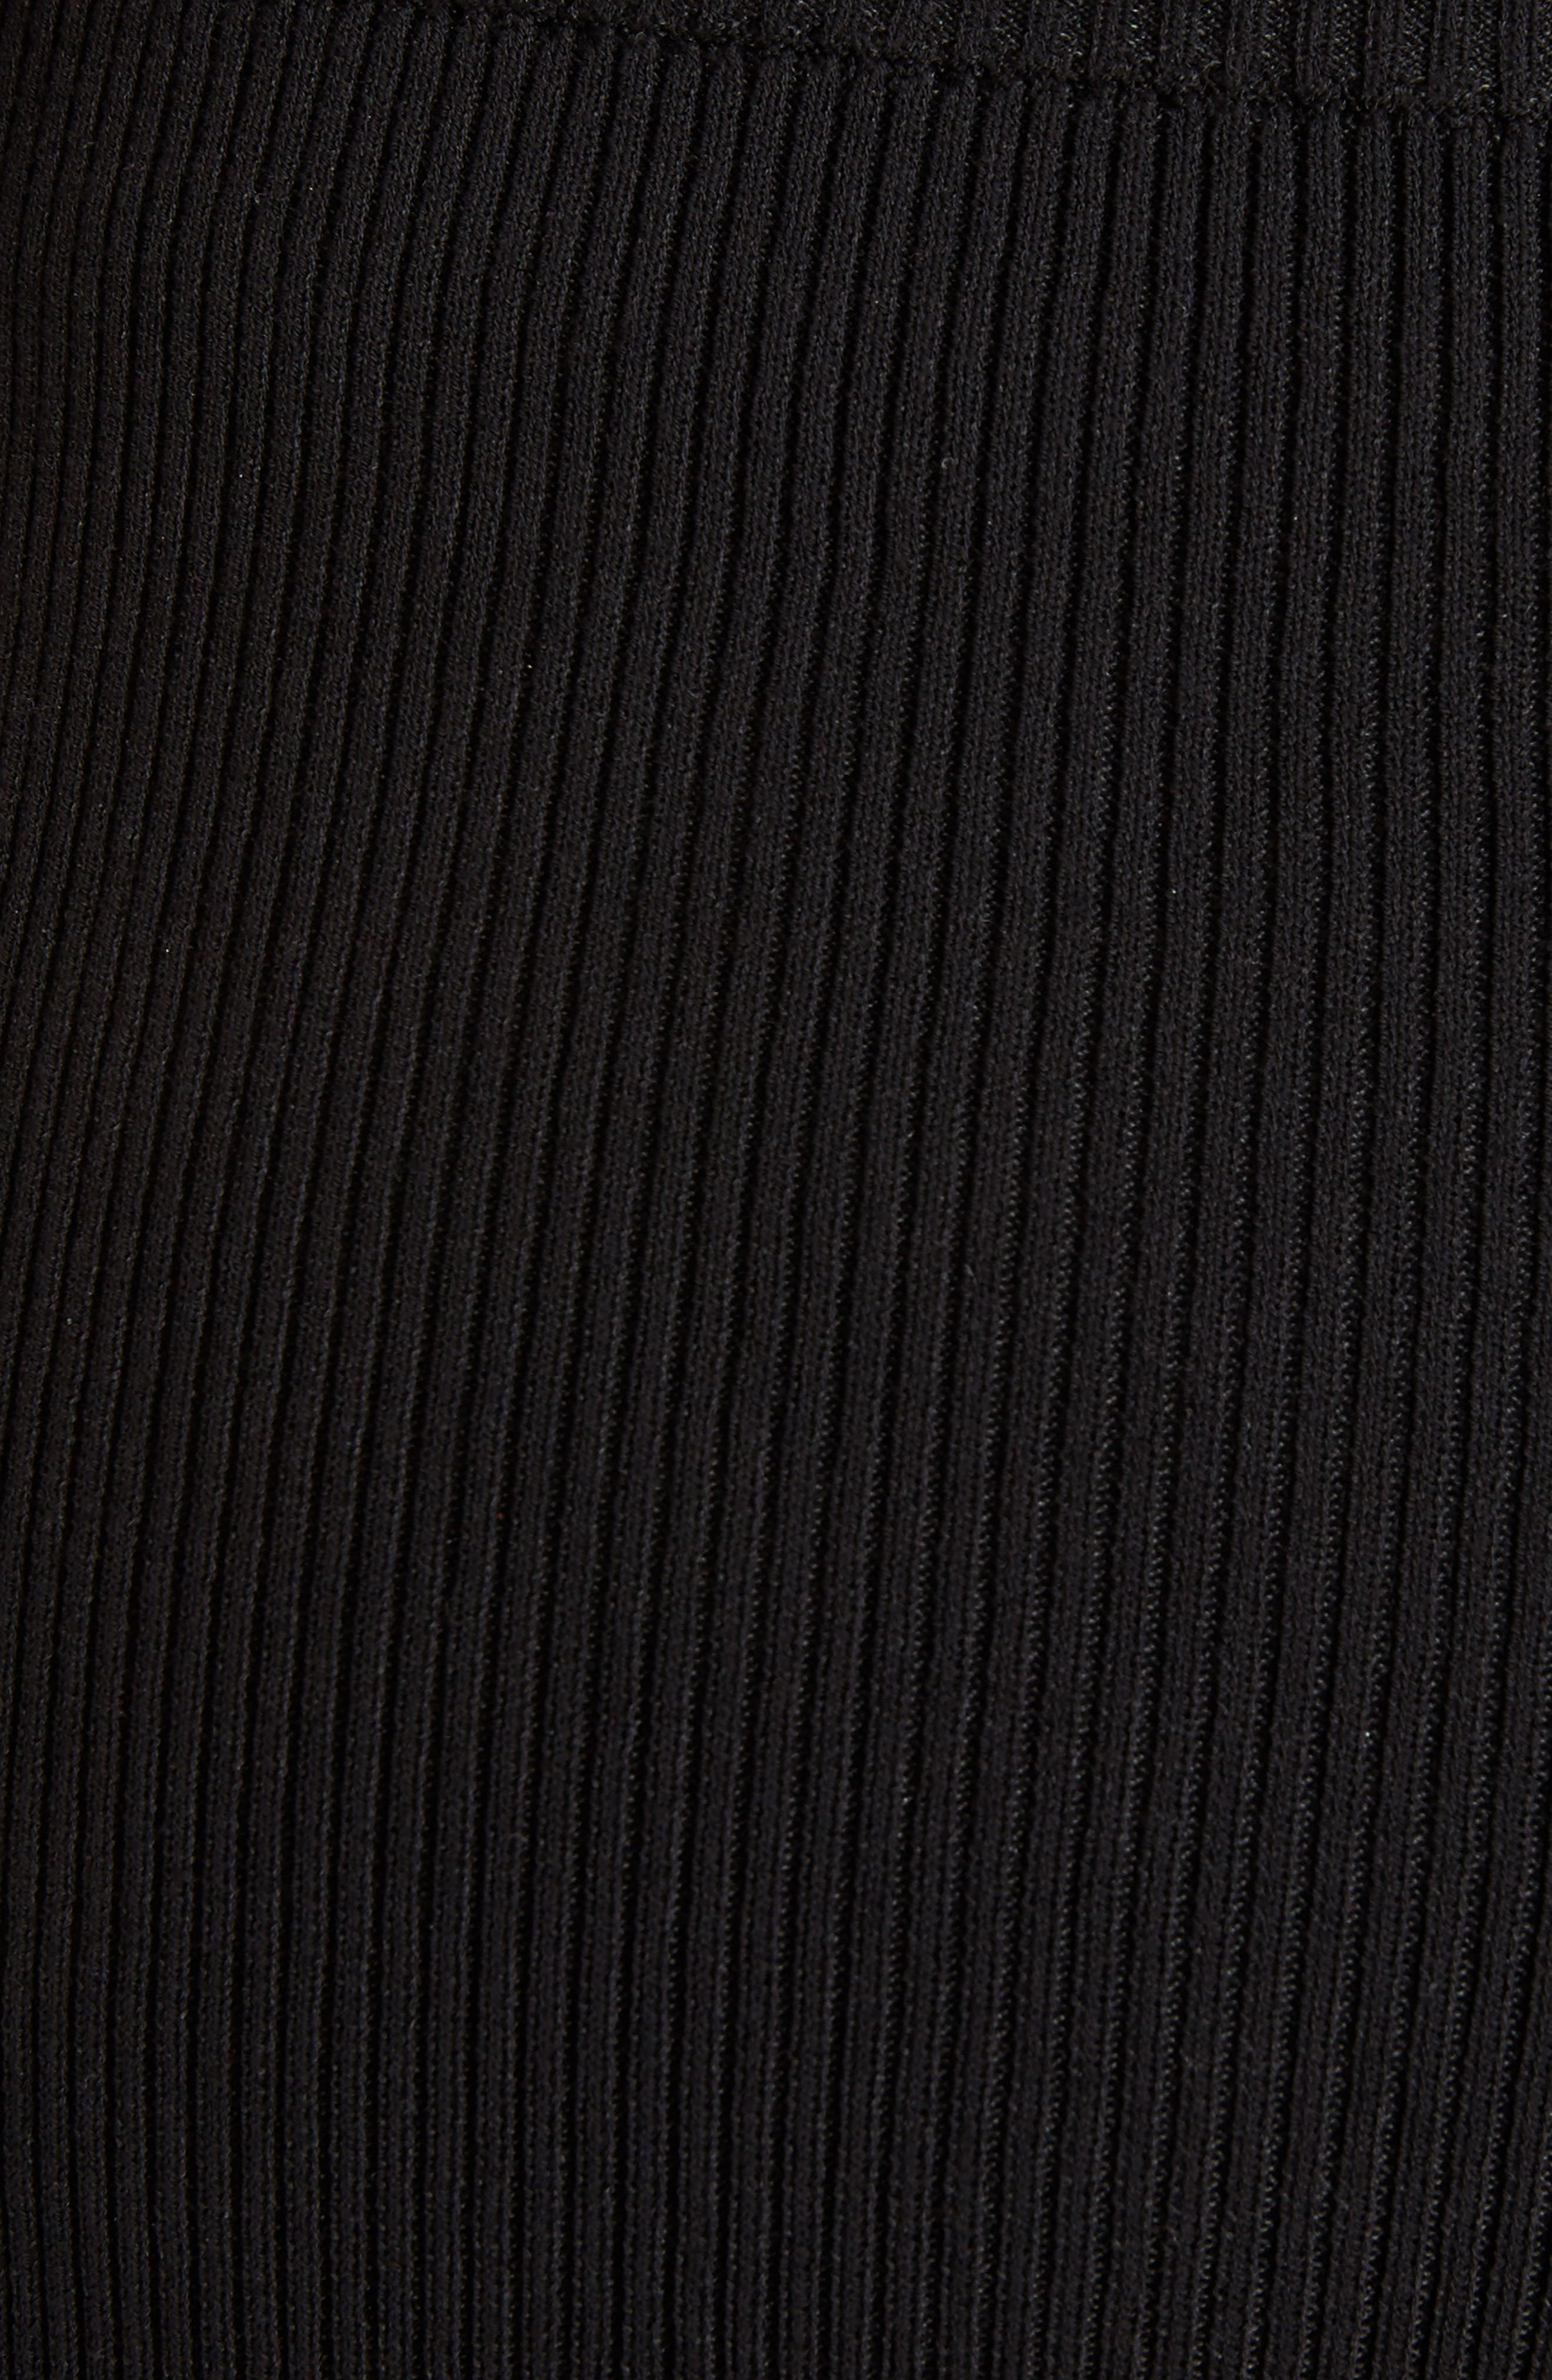 Stretch Knit Midi Skirt,                             Alternate thumbnail 5, color,                             001